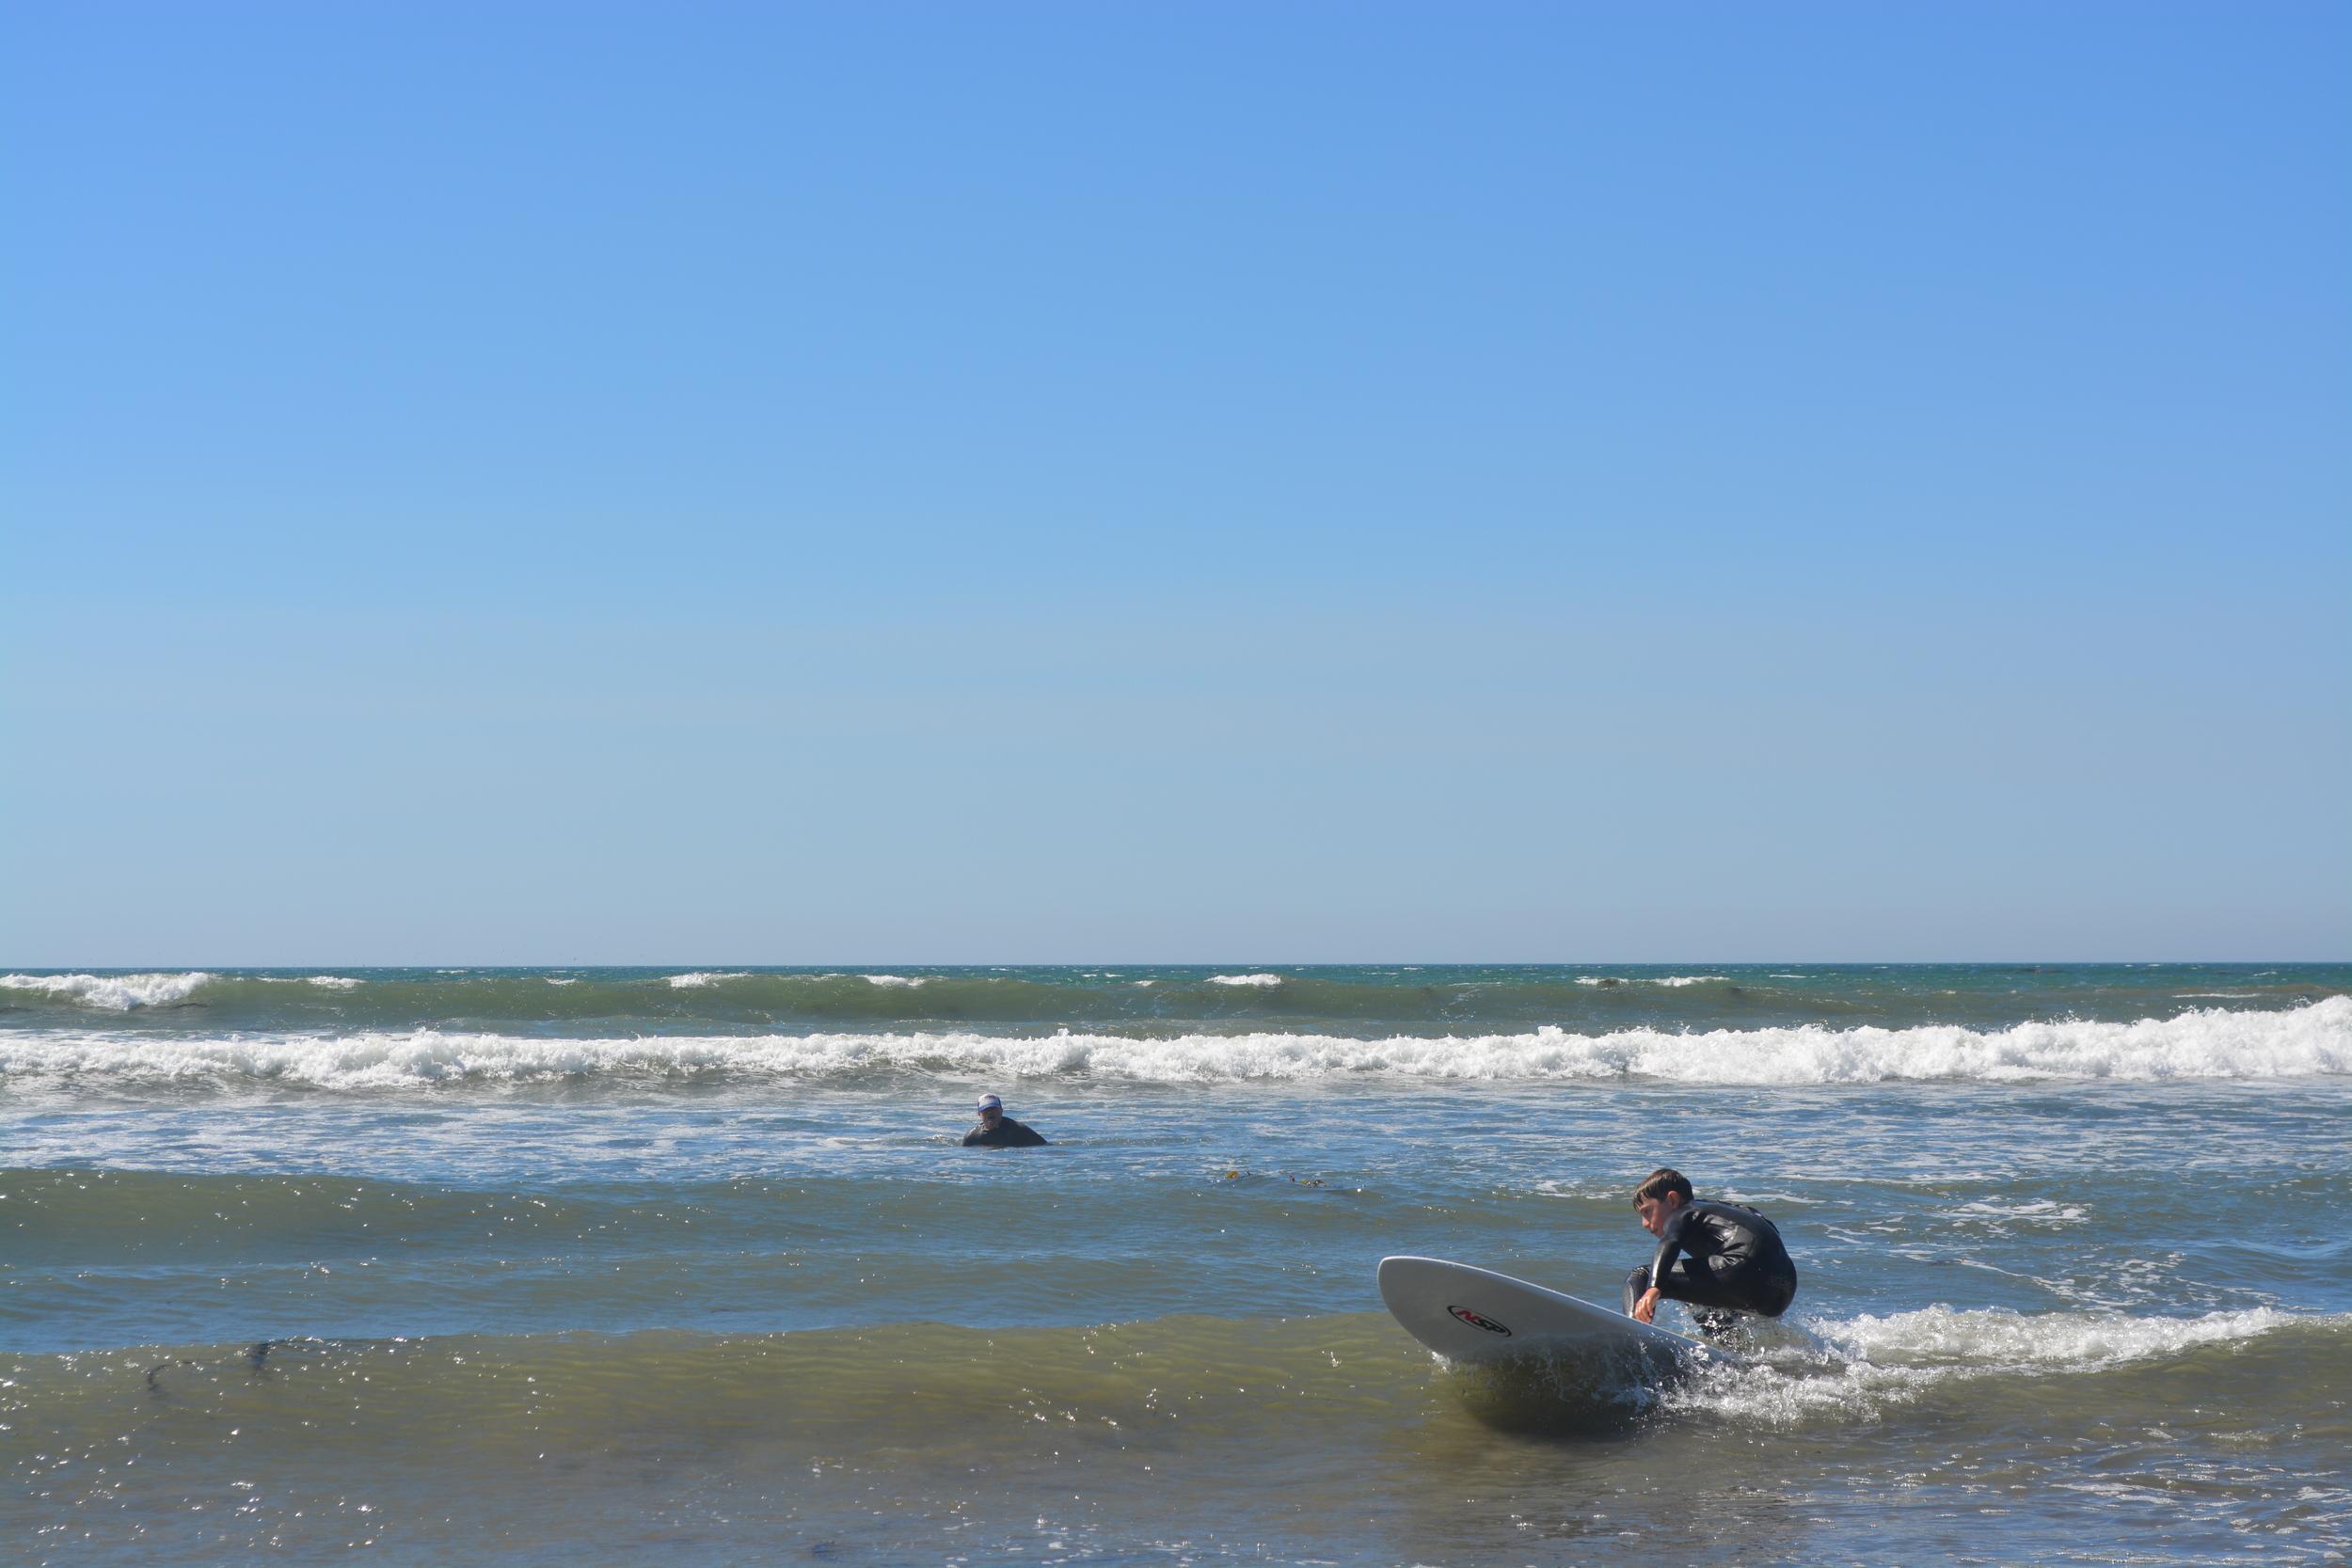 Baja California 10-5-13 Shipwrecks Surfing Adventure Ocean Experience Surf School San Diego (5).JPG